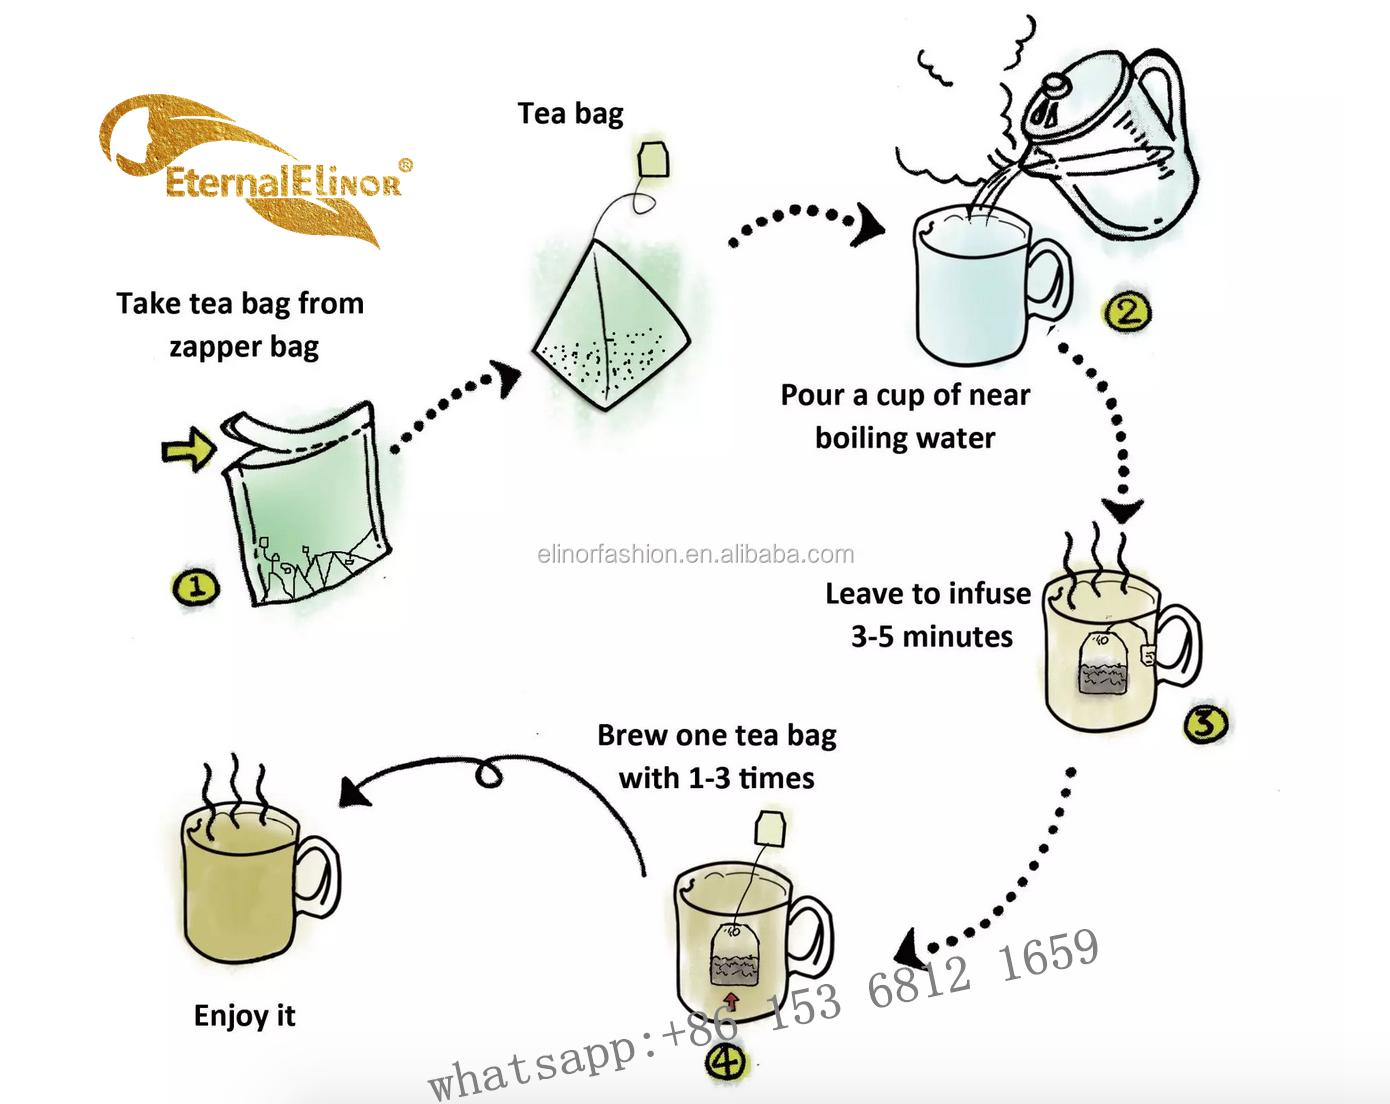 Eternal Elinor Slimming Detox Tea weight loss 28 days detox tea flat tummy tea - 4uTea | 4uTea.com